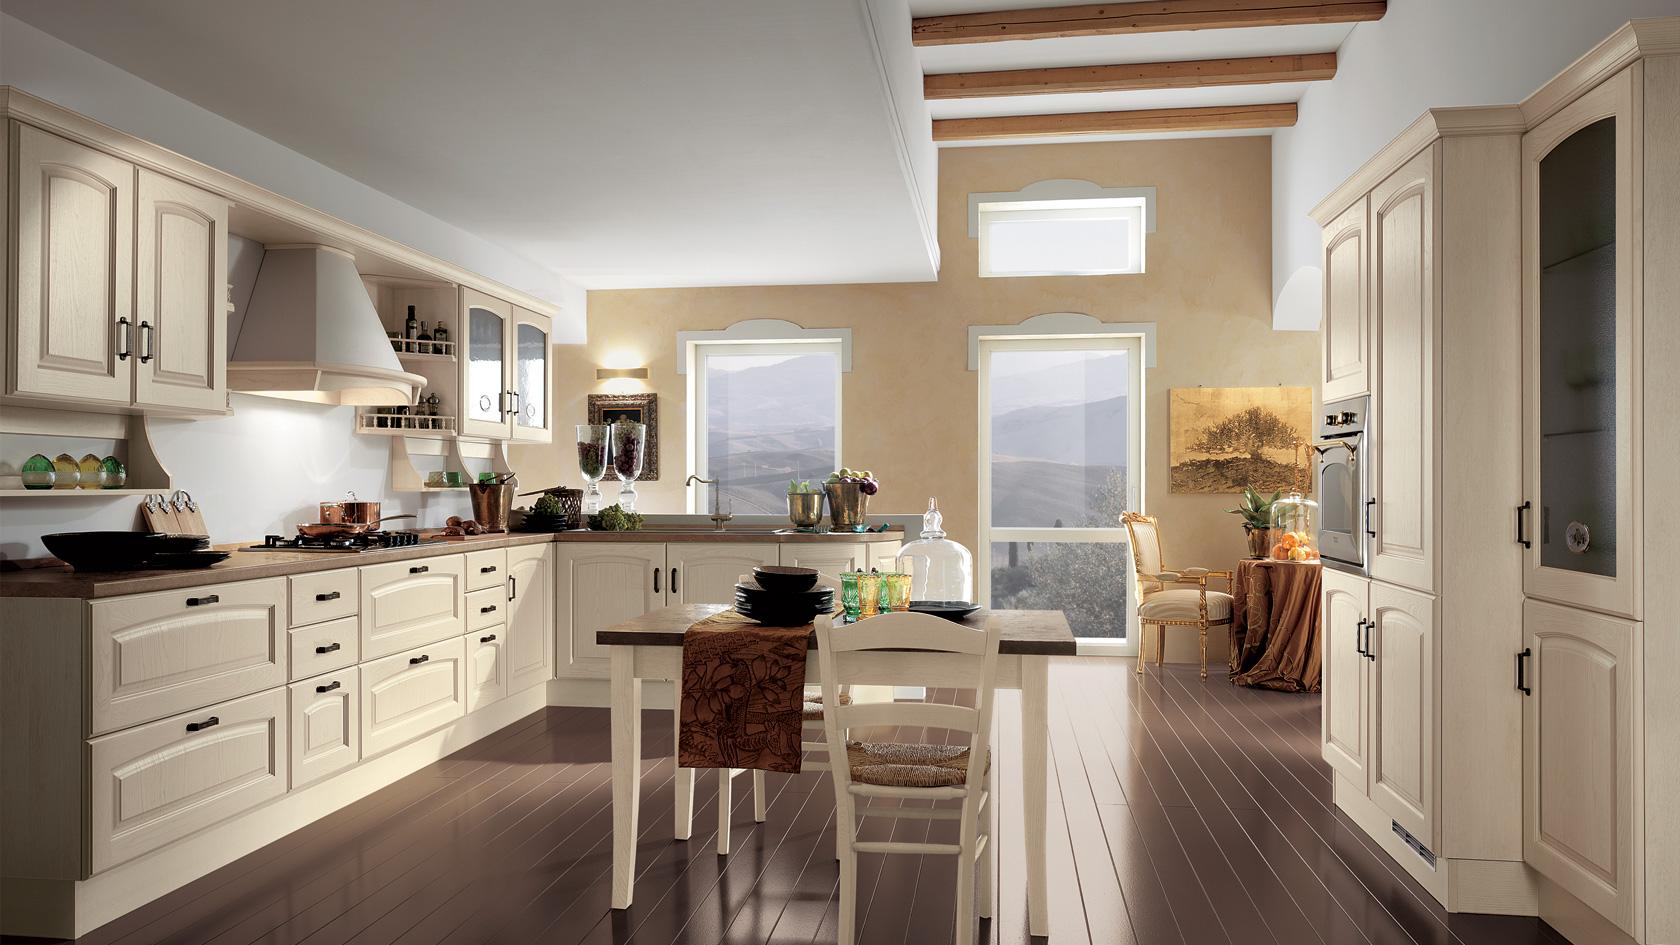 top cucina scavolini - 28 images - emejing top cucina scavolini ...